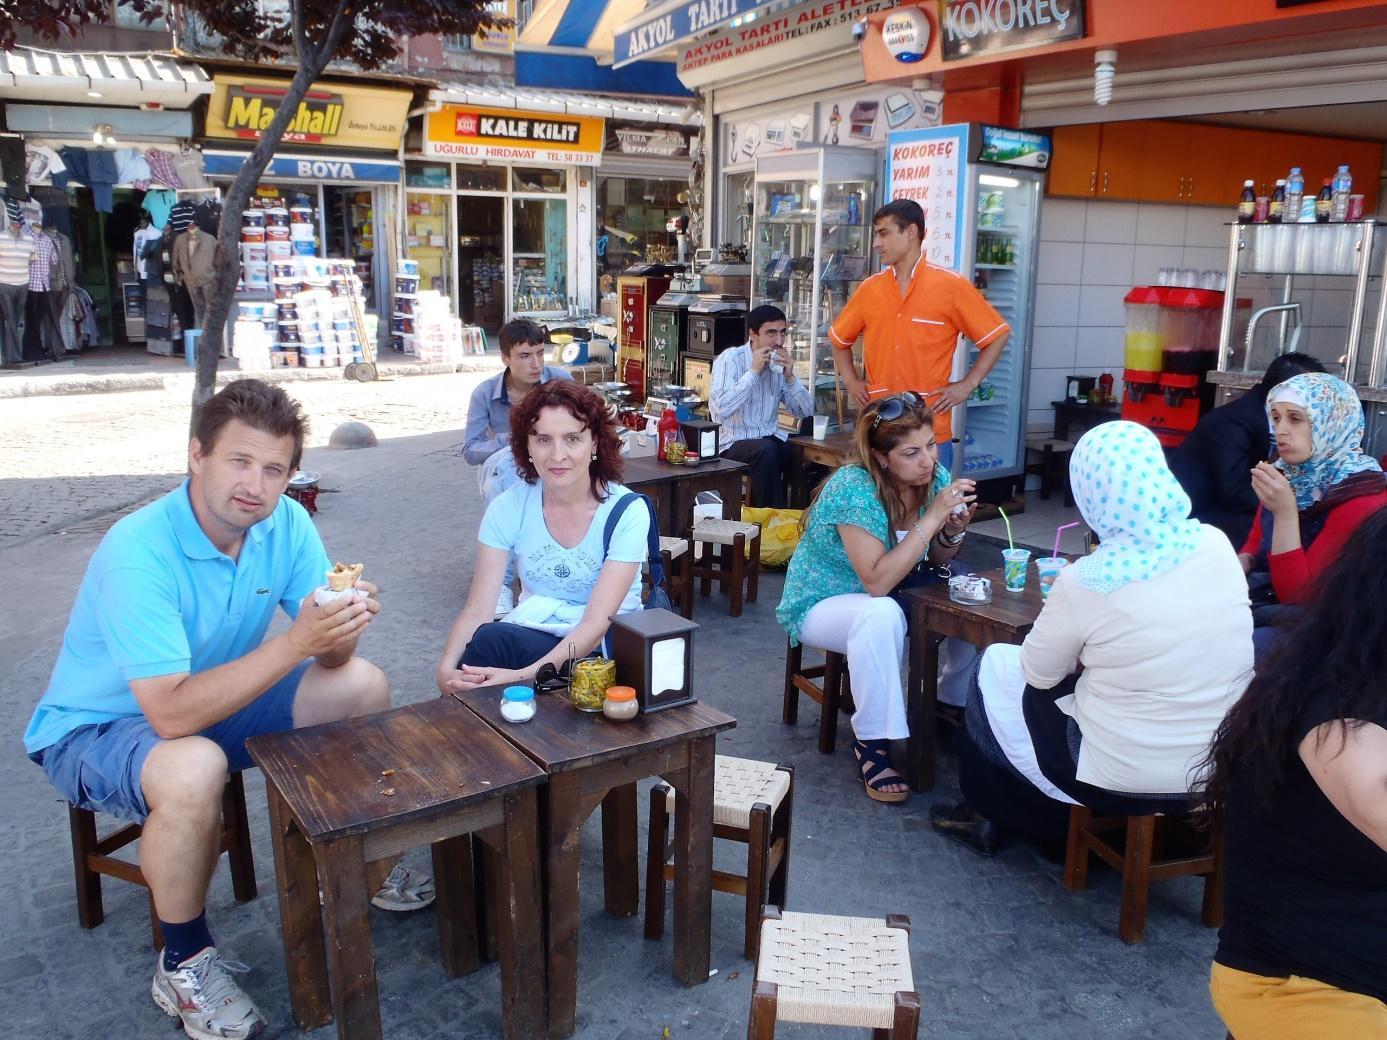 C:\Users\Administrator\Documents\Documents\Putovanja\PUTOPISI\TURSKA\3\Slike\14.jpg